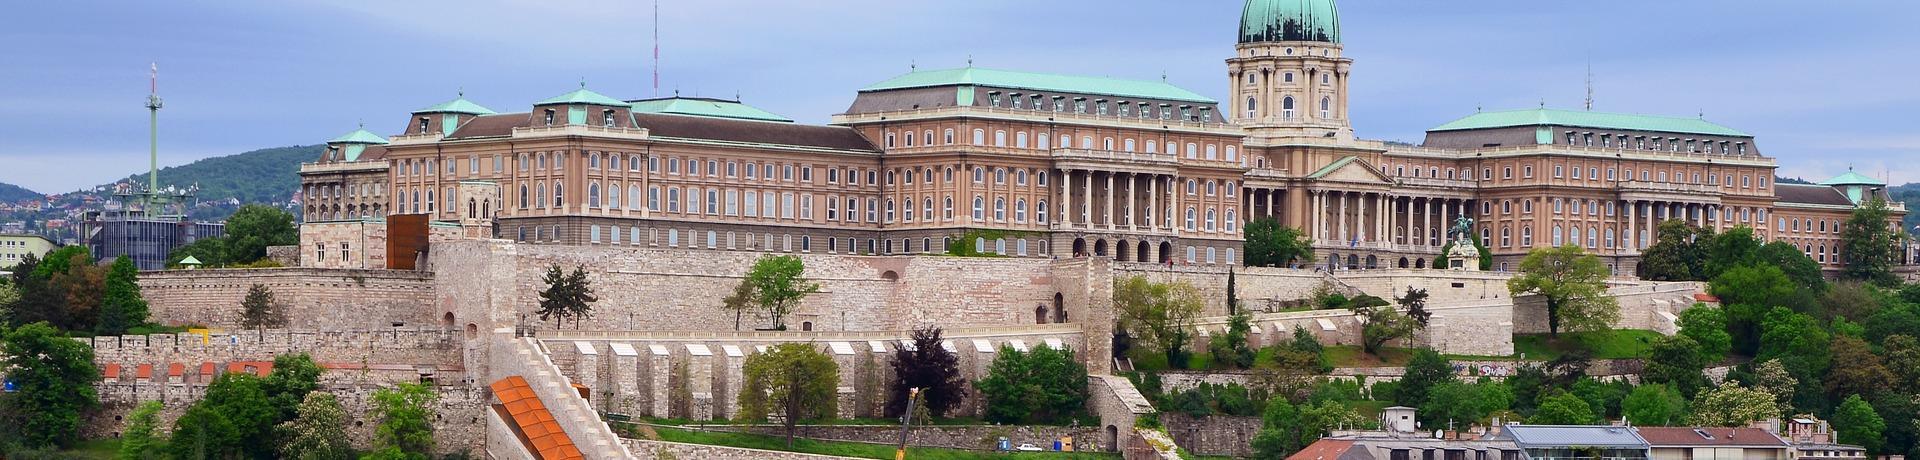 budapest-2637906-1920-1.jpg